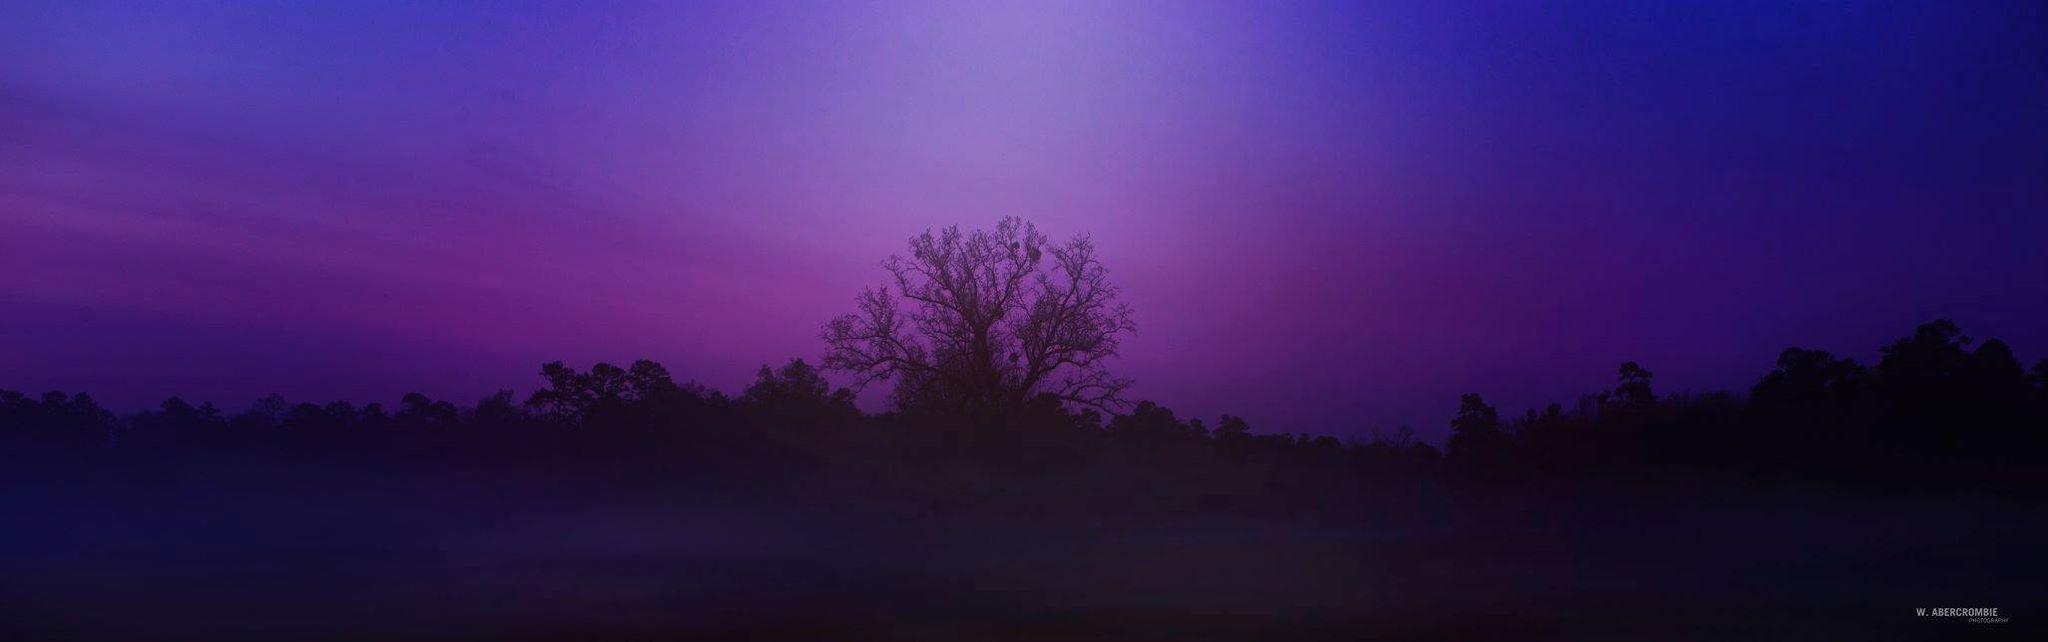 Foggy morning pre-sunrise in Chickamauga, Battlefield